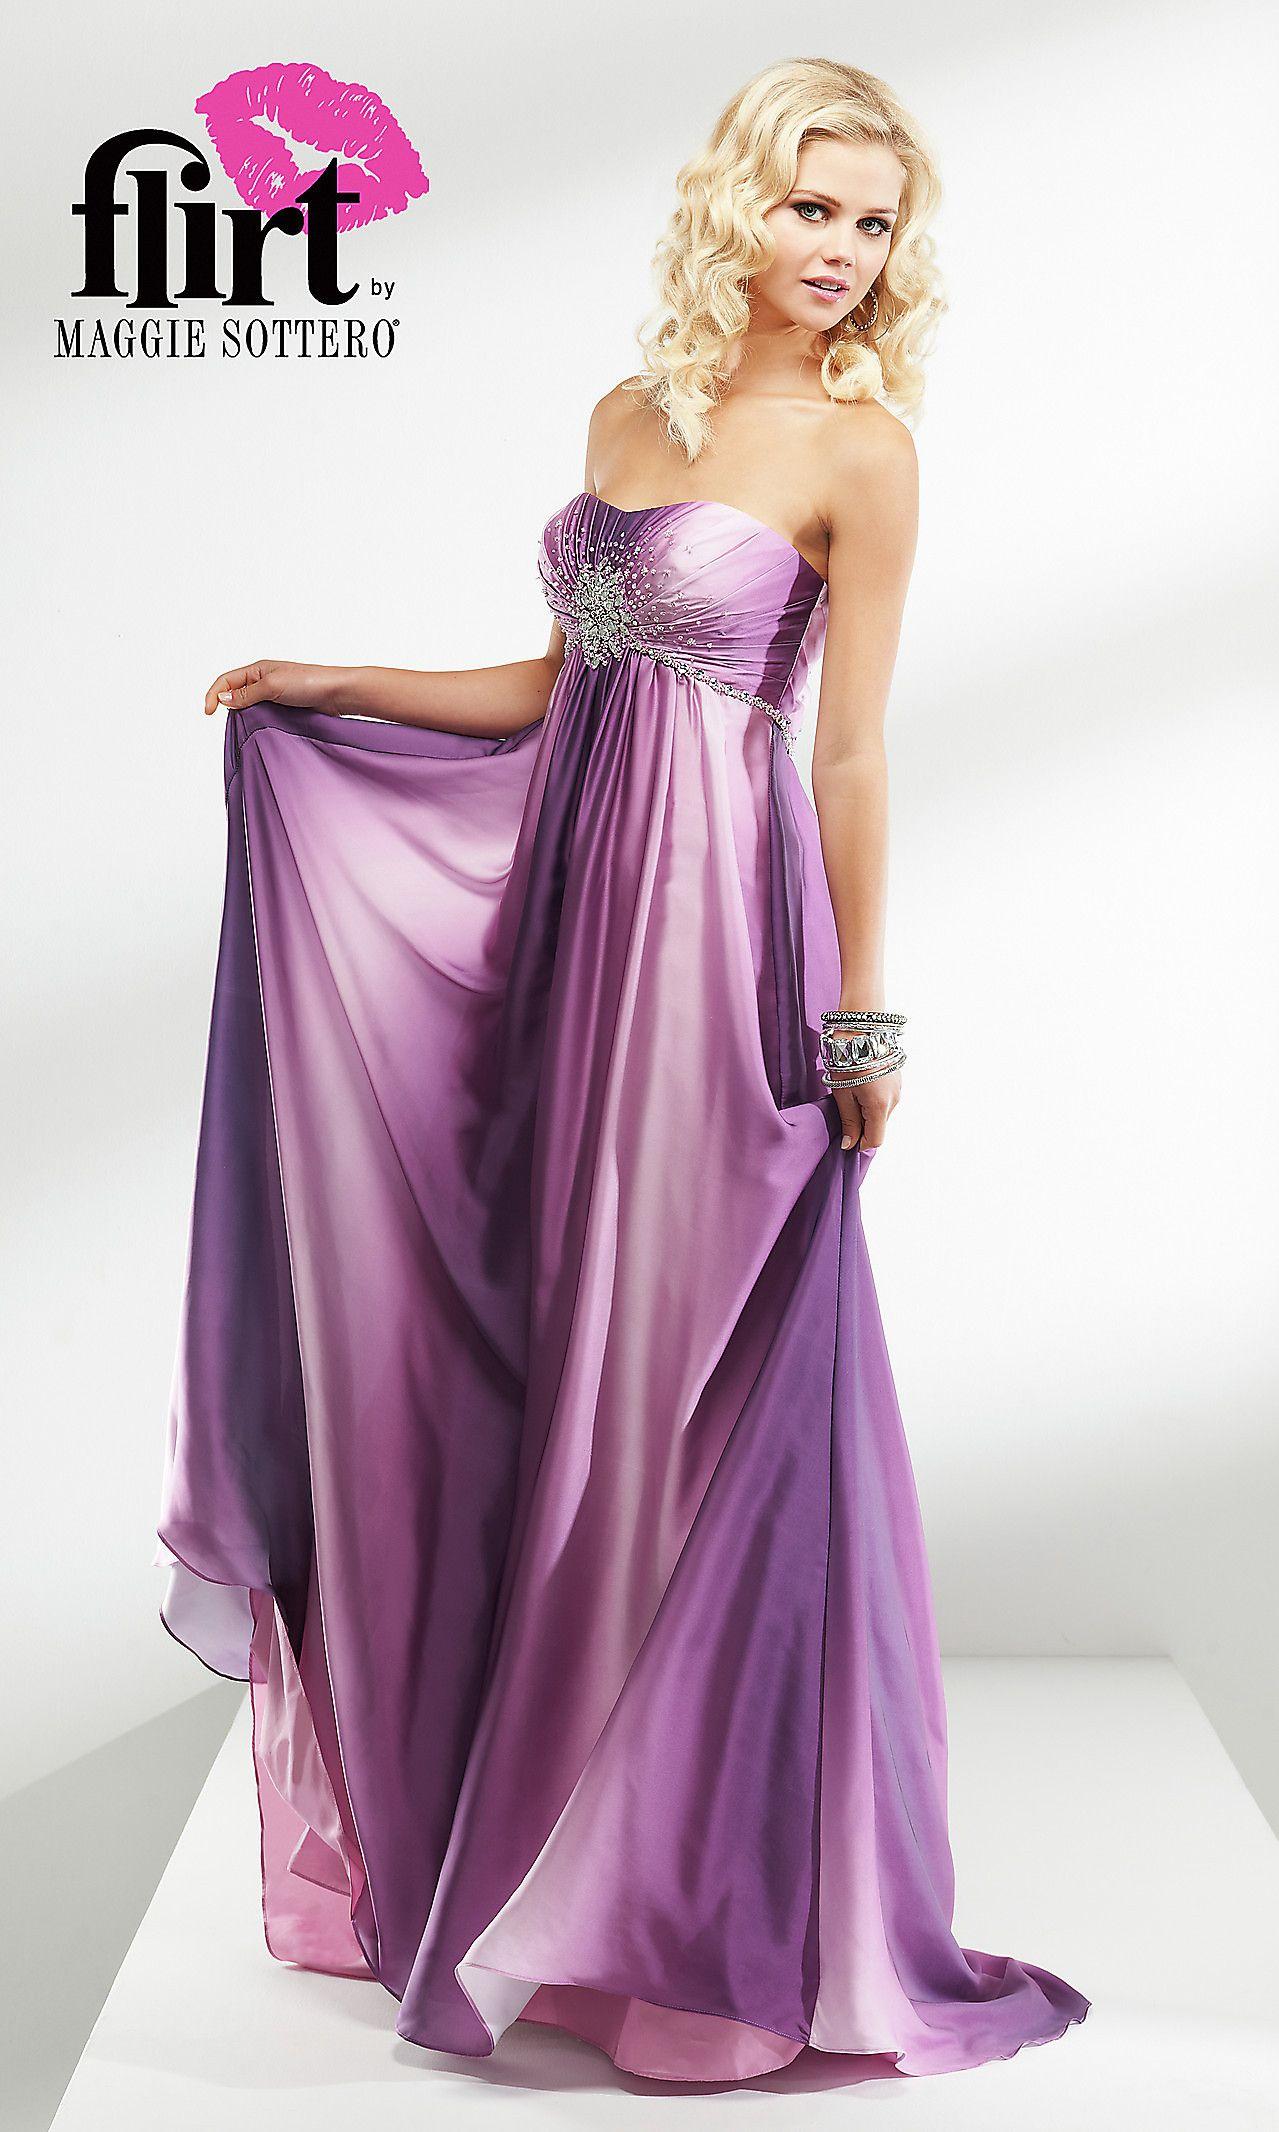 Strapless Ombre Prom Dress by Flirt FL-P4623 | I love | Pinterest